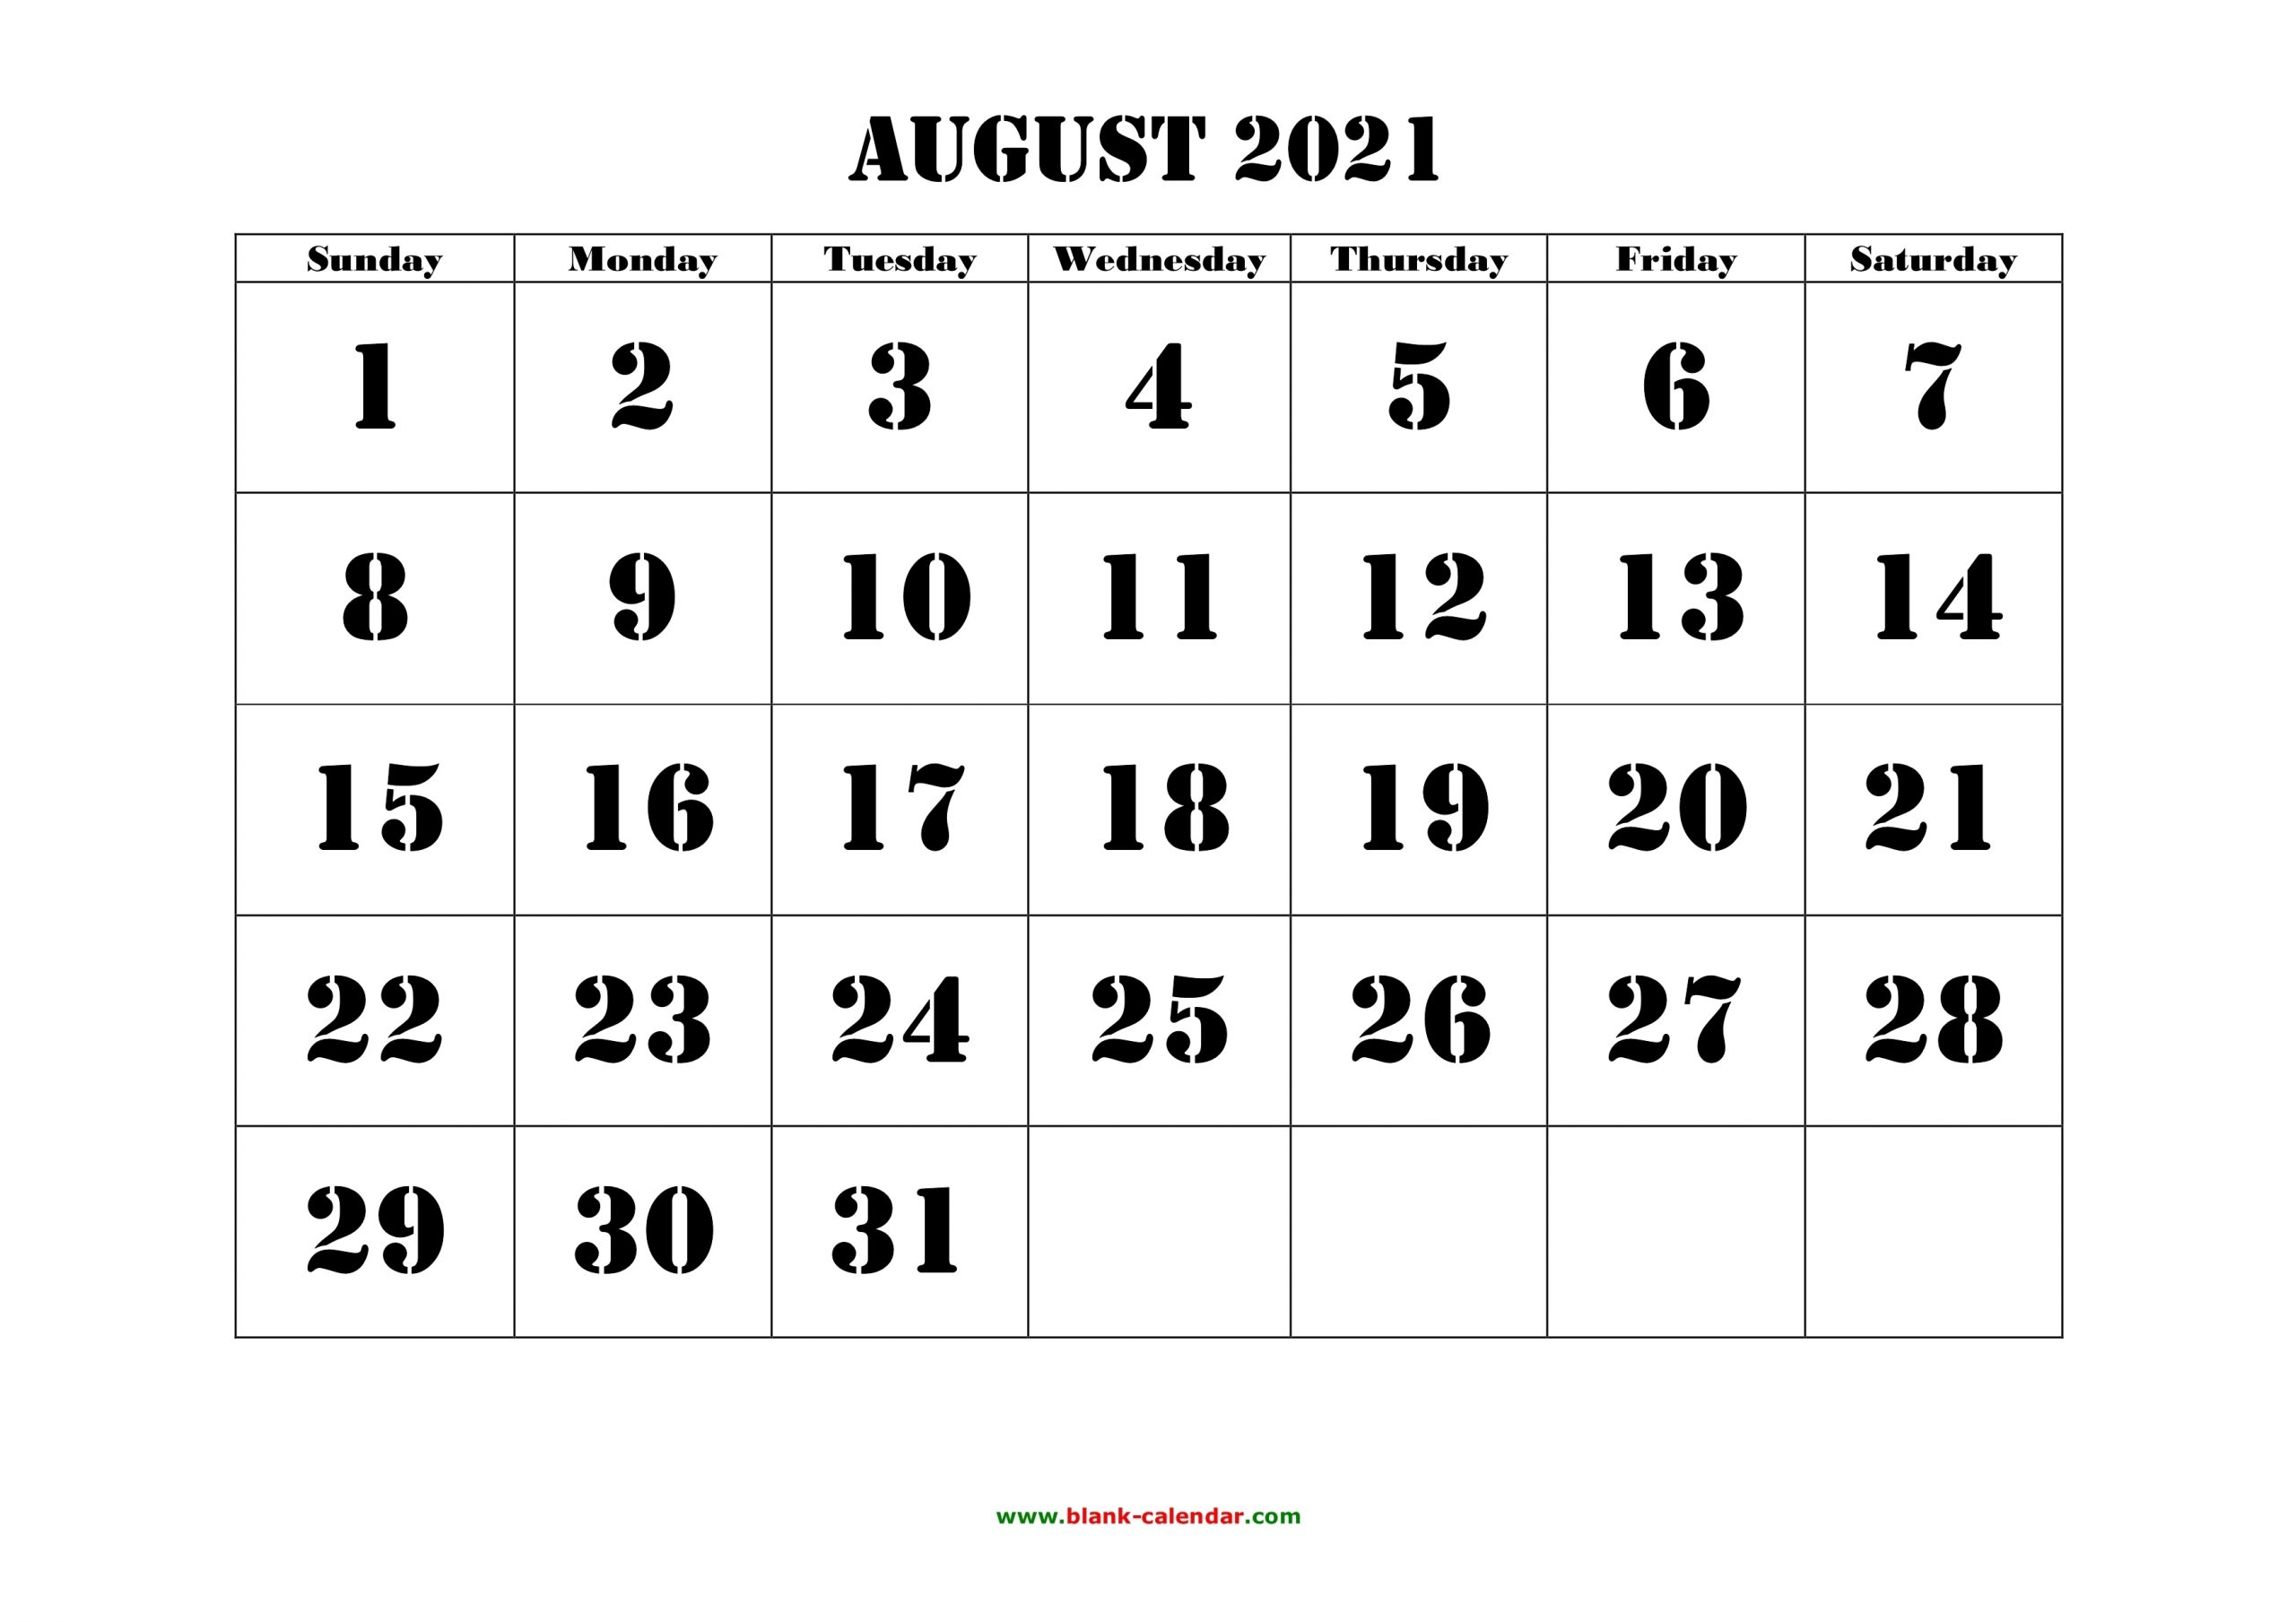 Free Download Printable August 2021 Calendar, Large Font